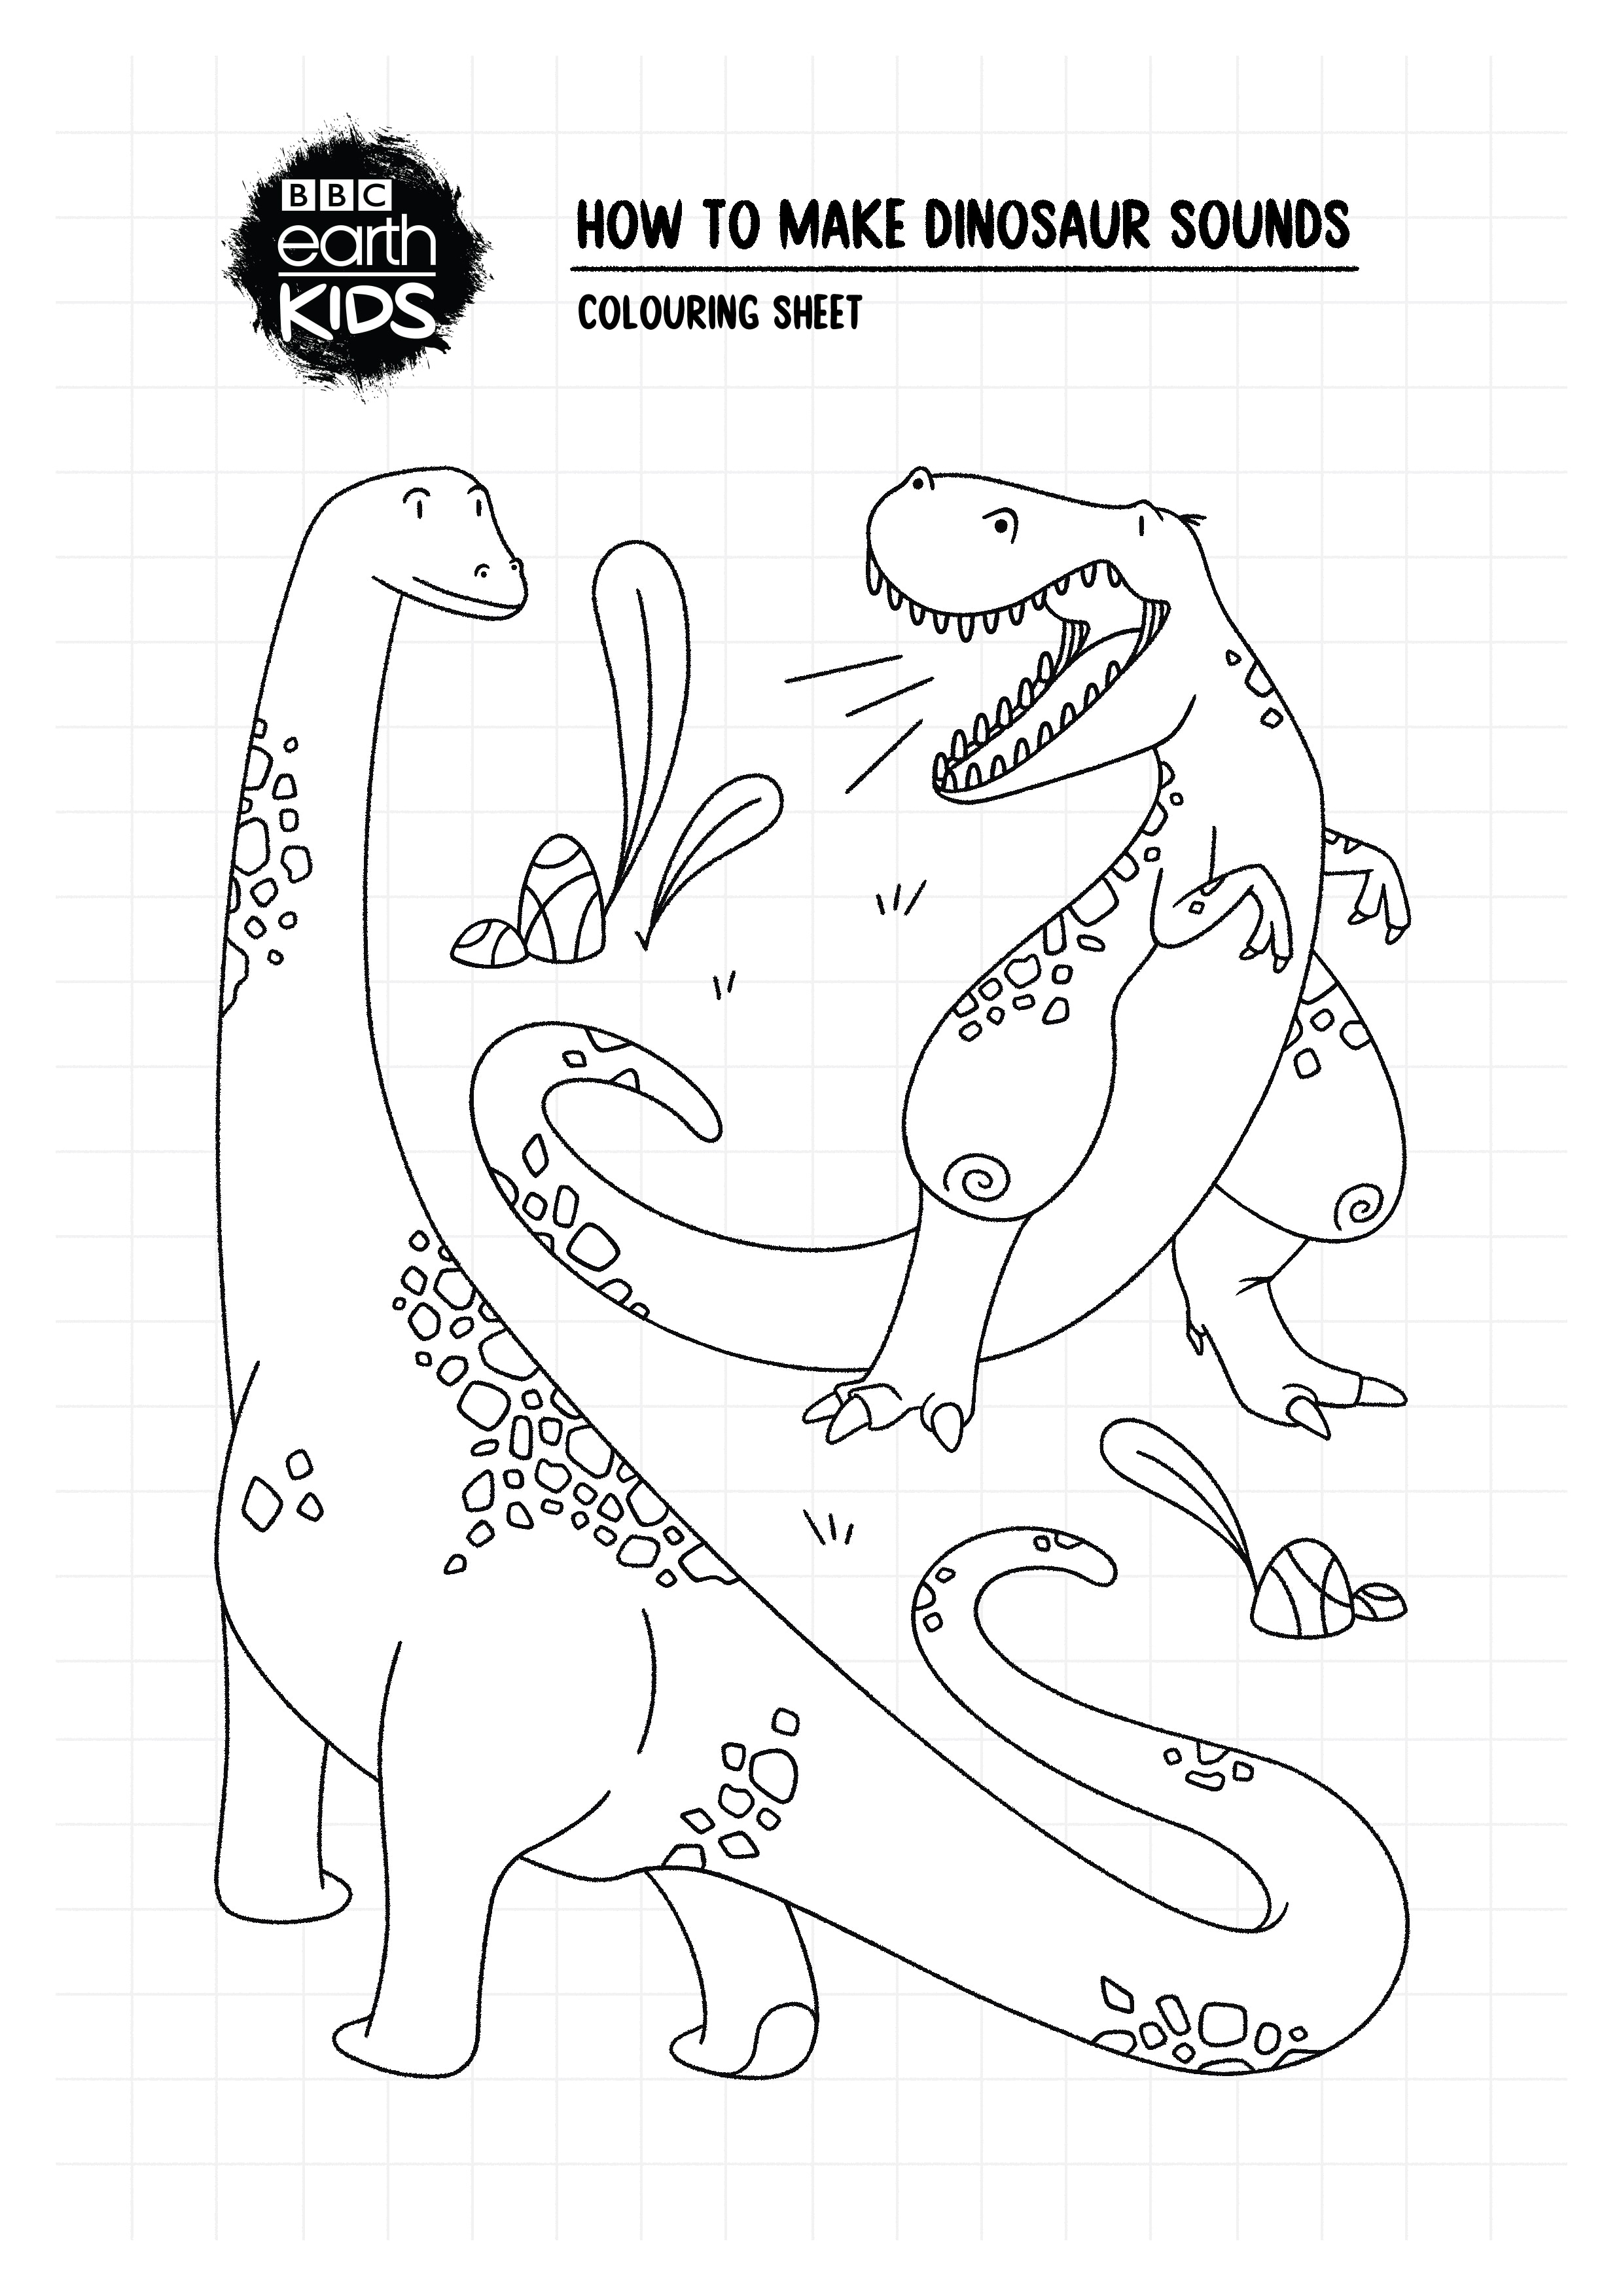 Dinosaur colouring sheet